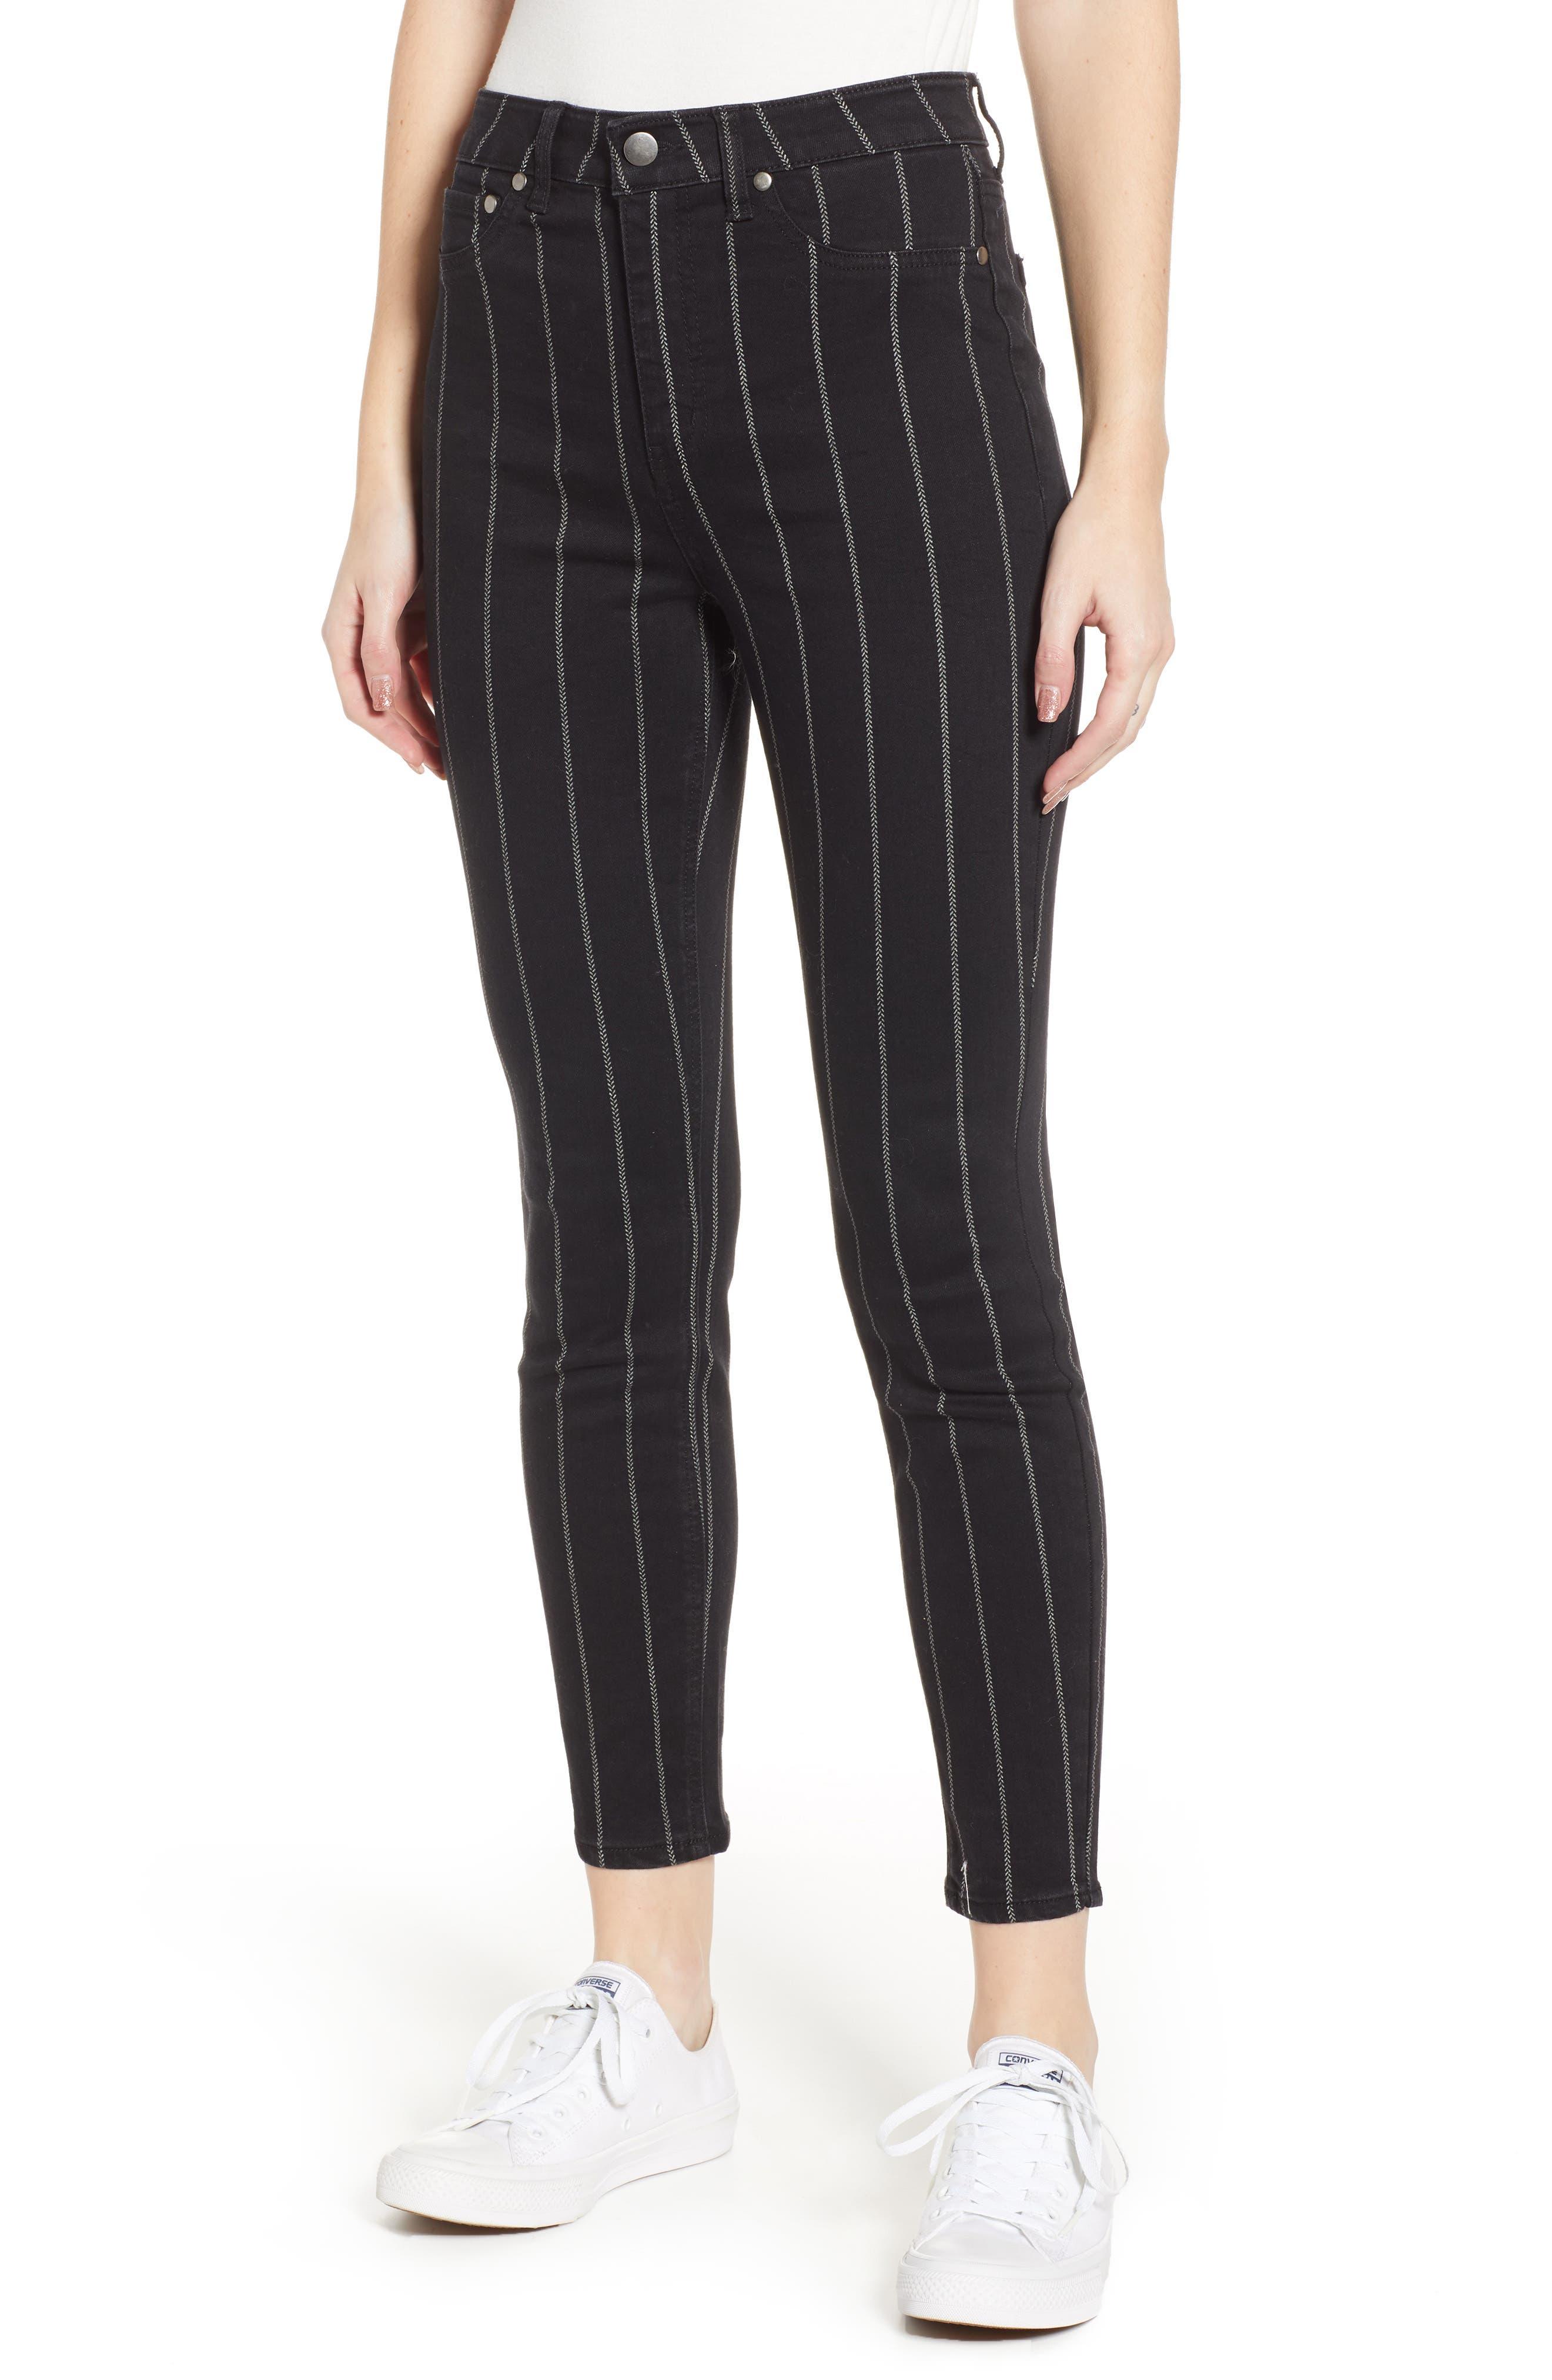 TINSEL Stripe High Rise Skinny Jeans, Main, color, 001